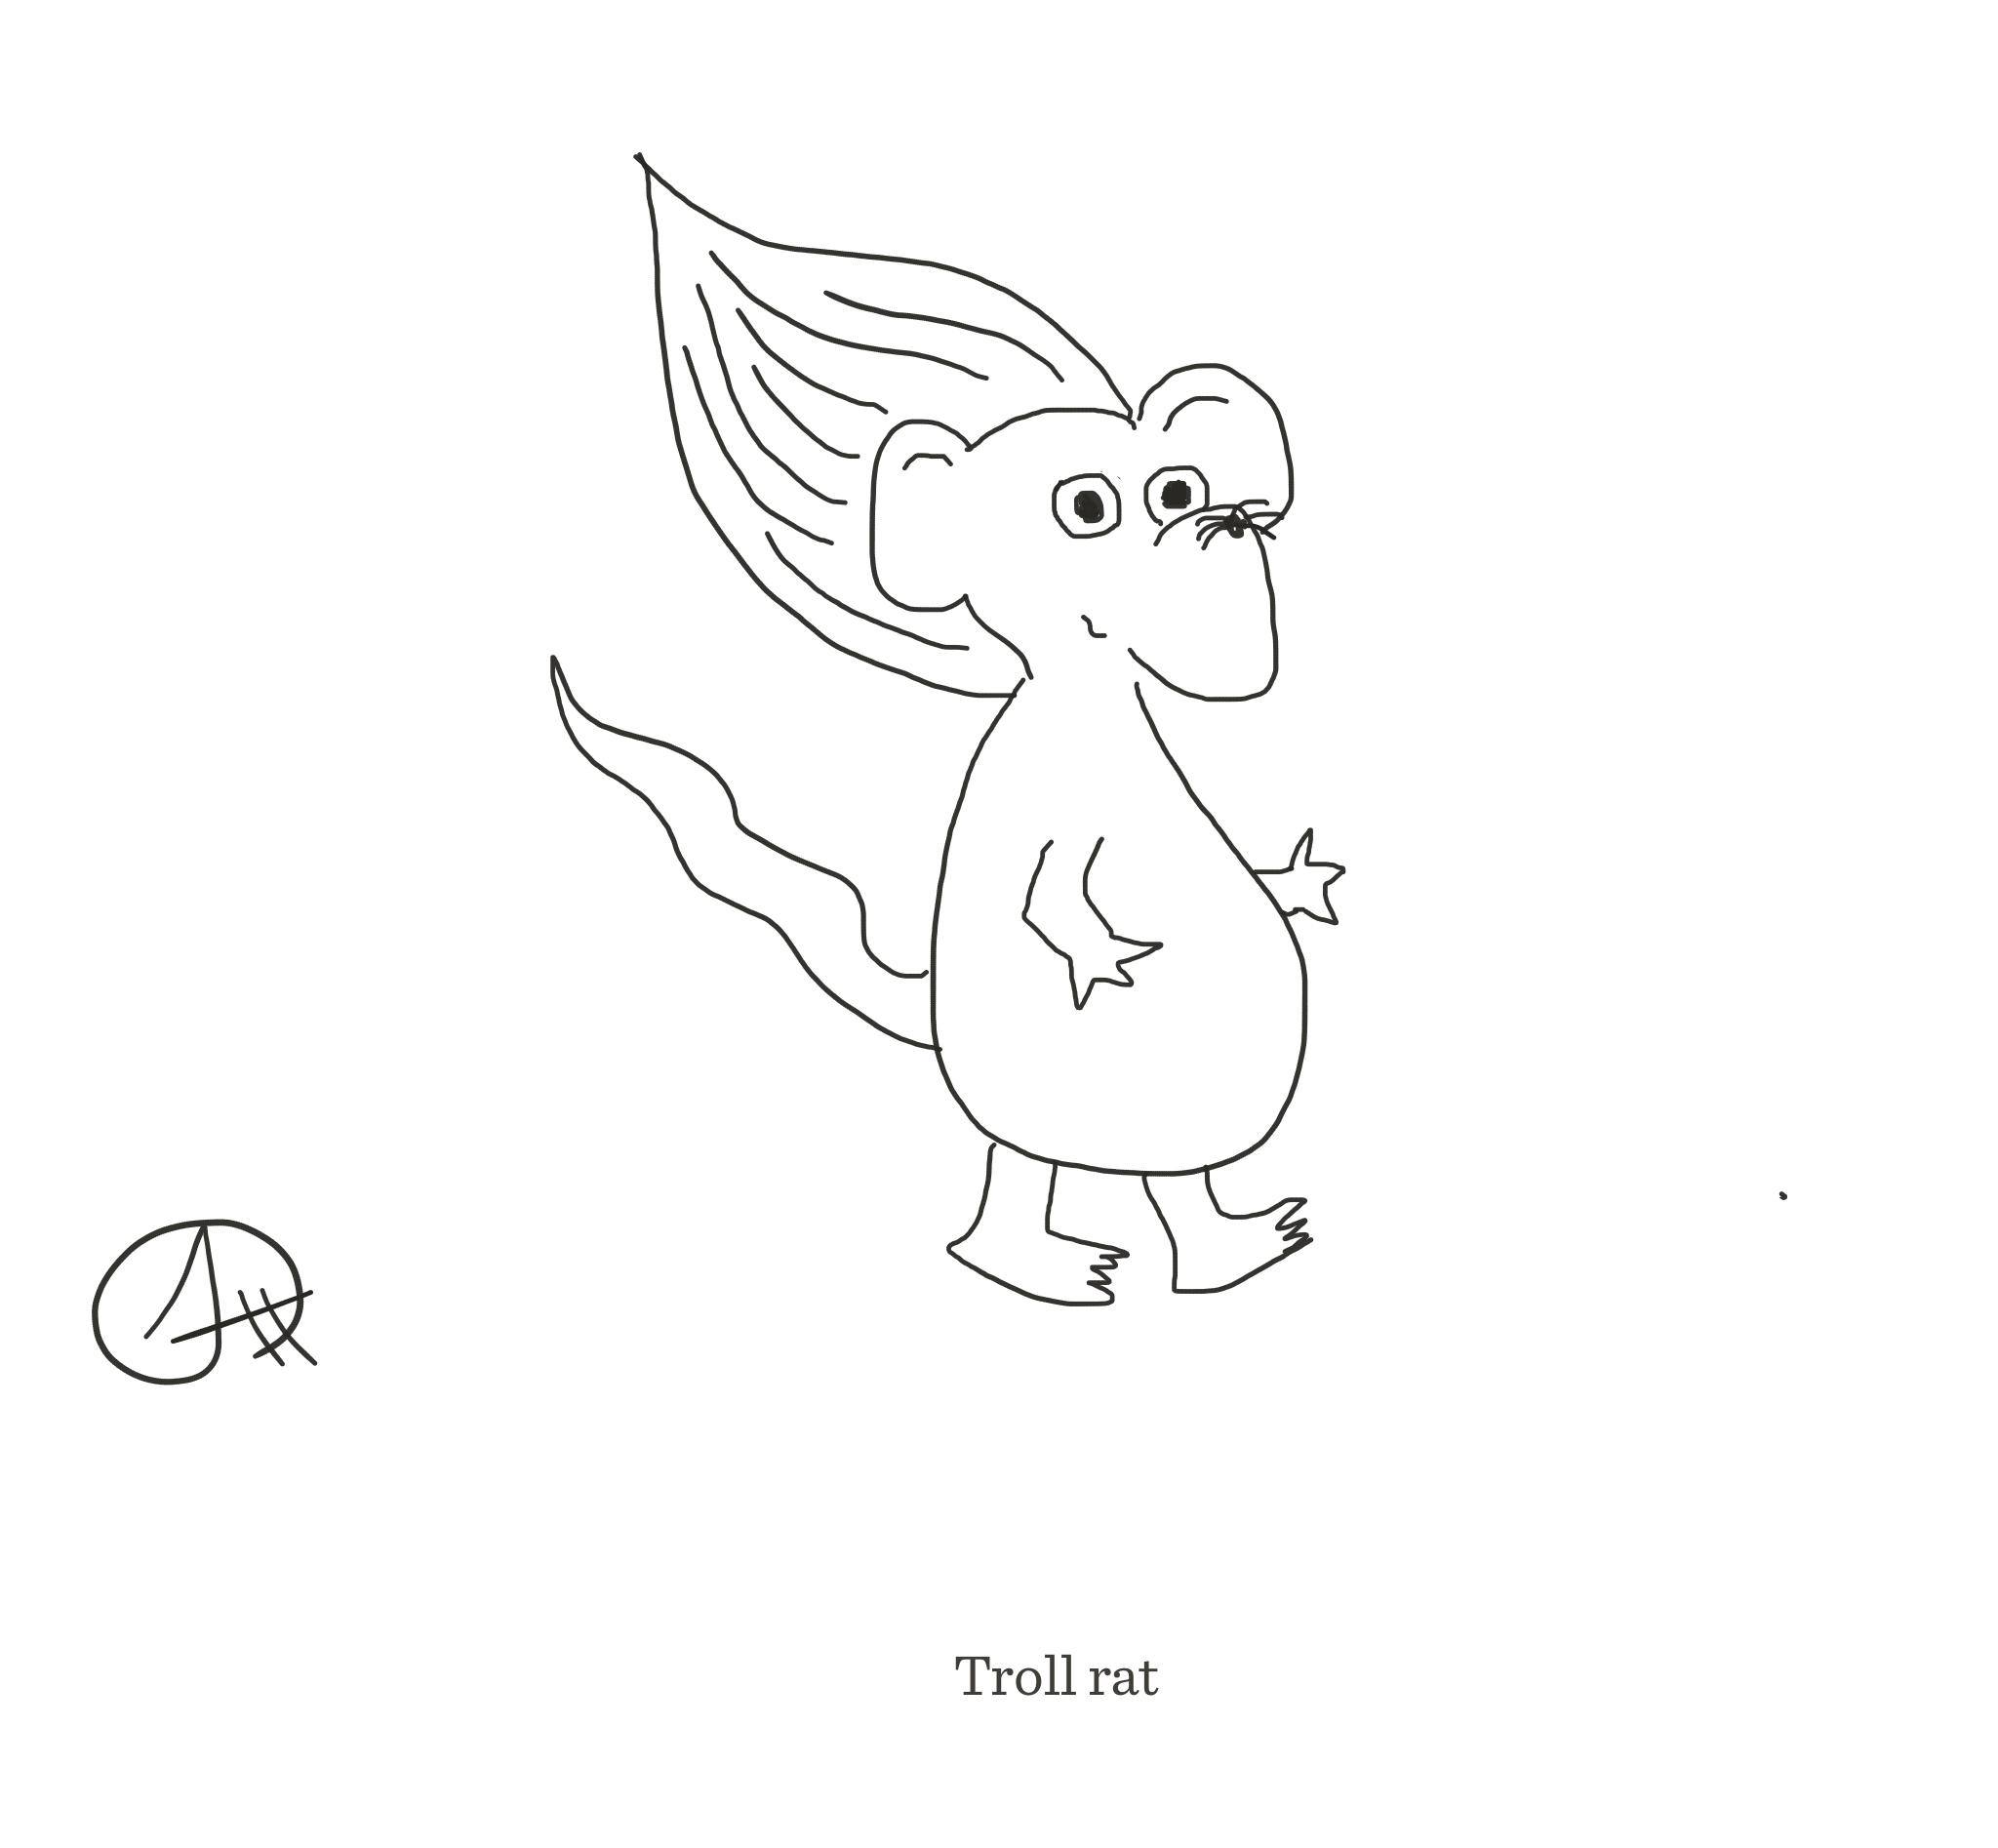 Troll rat, The Happy Rat cartoon